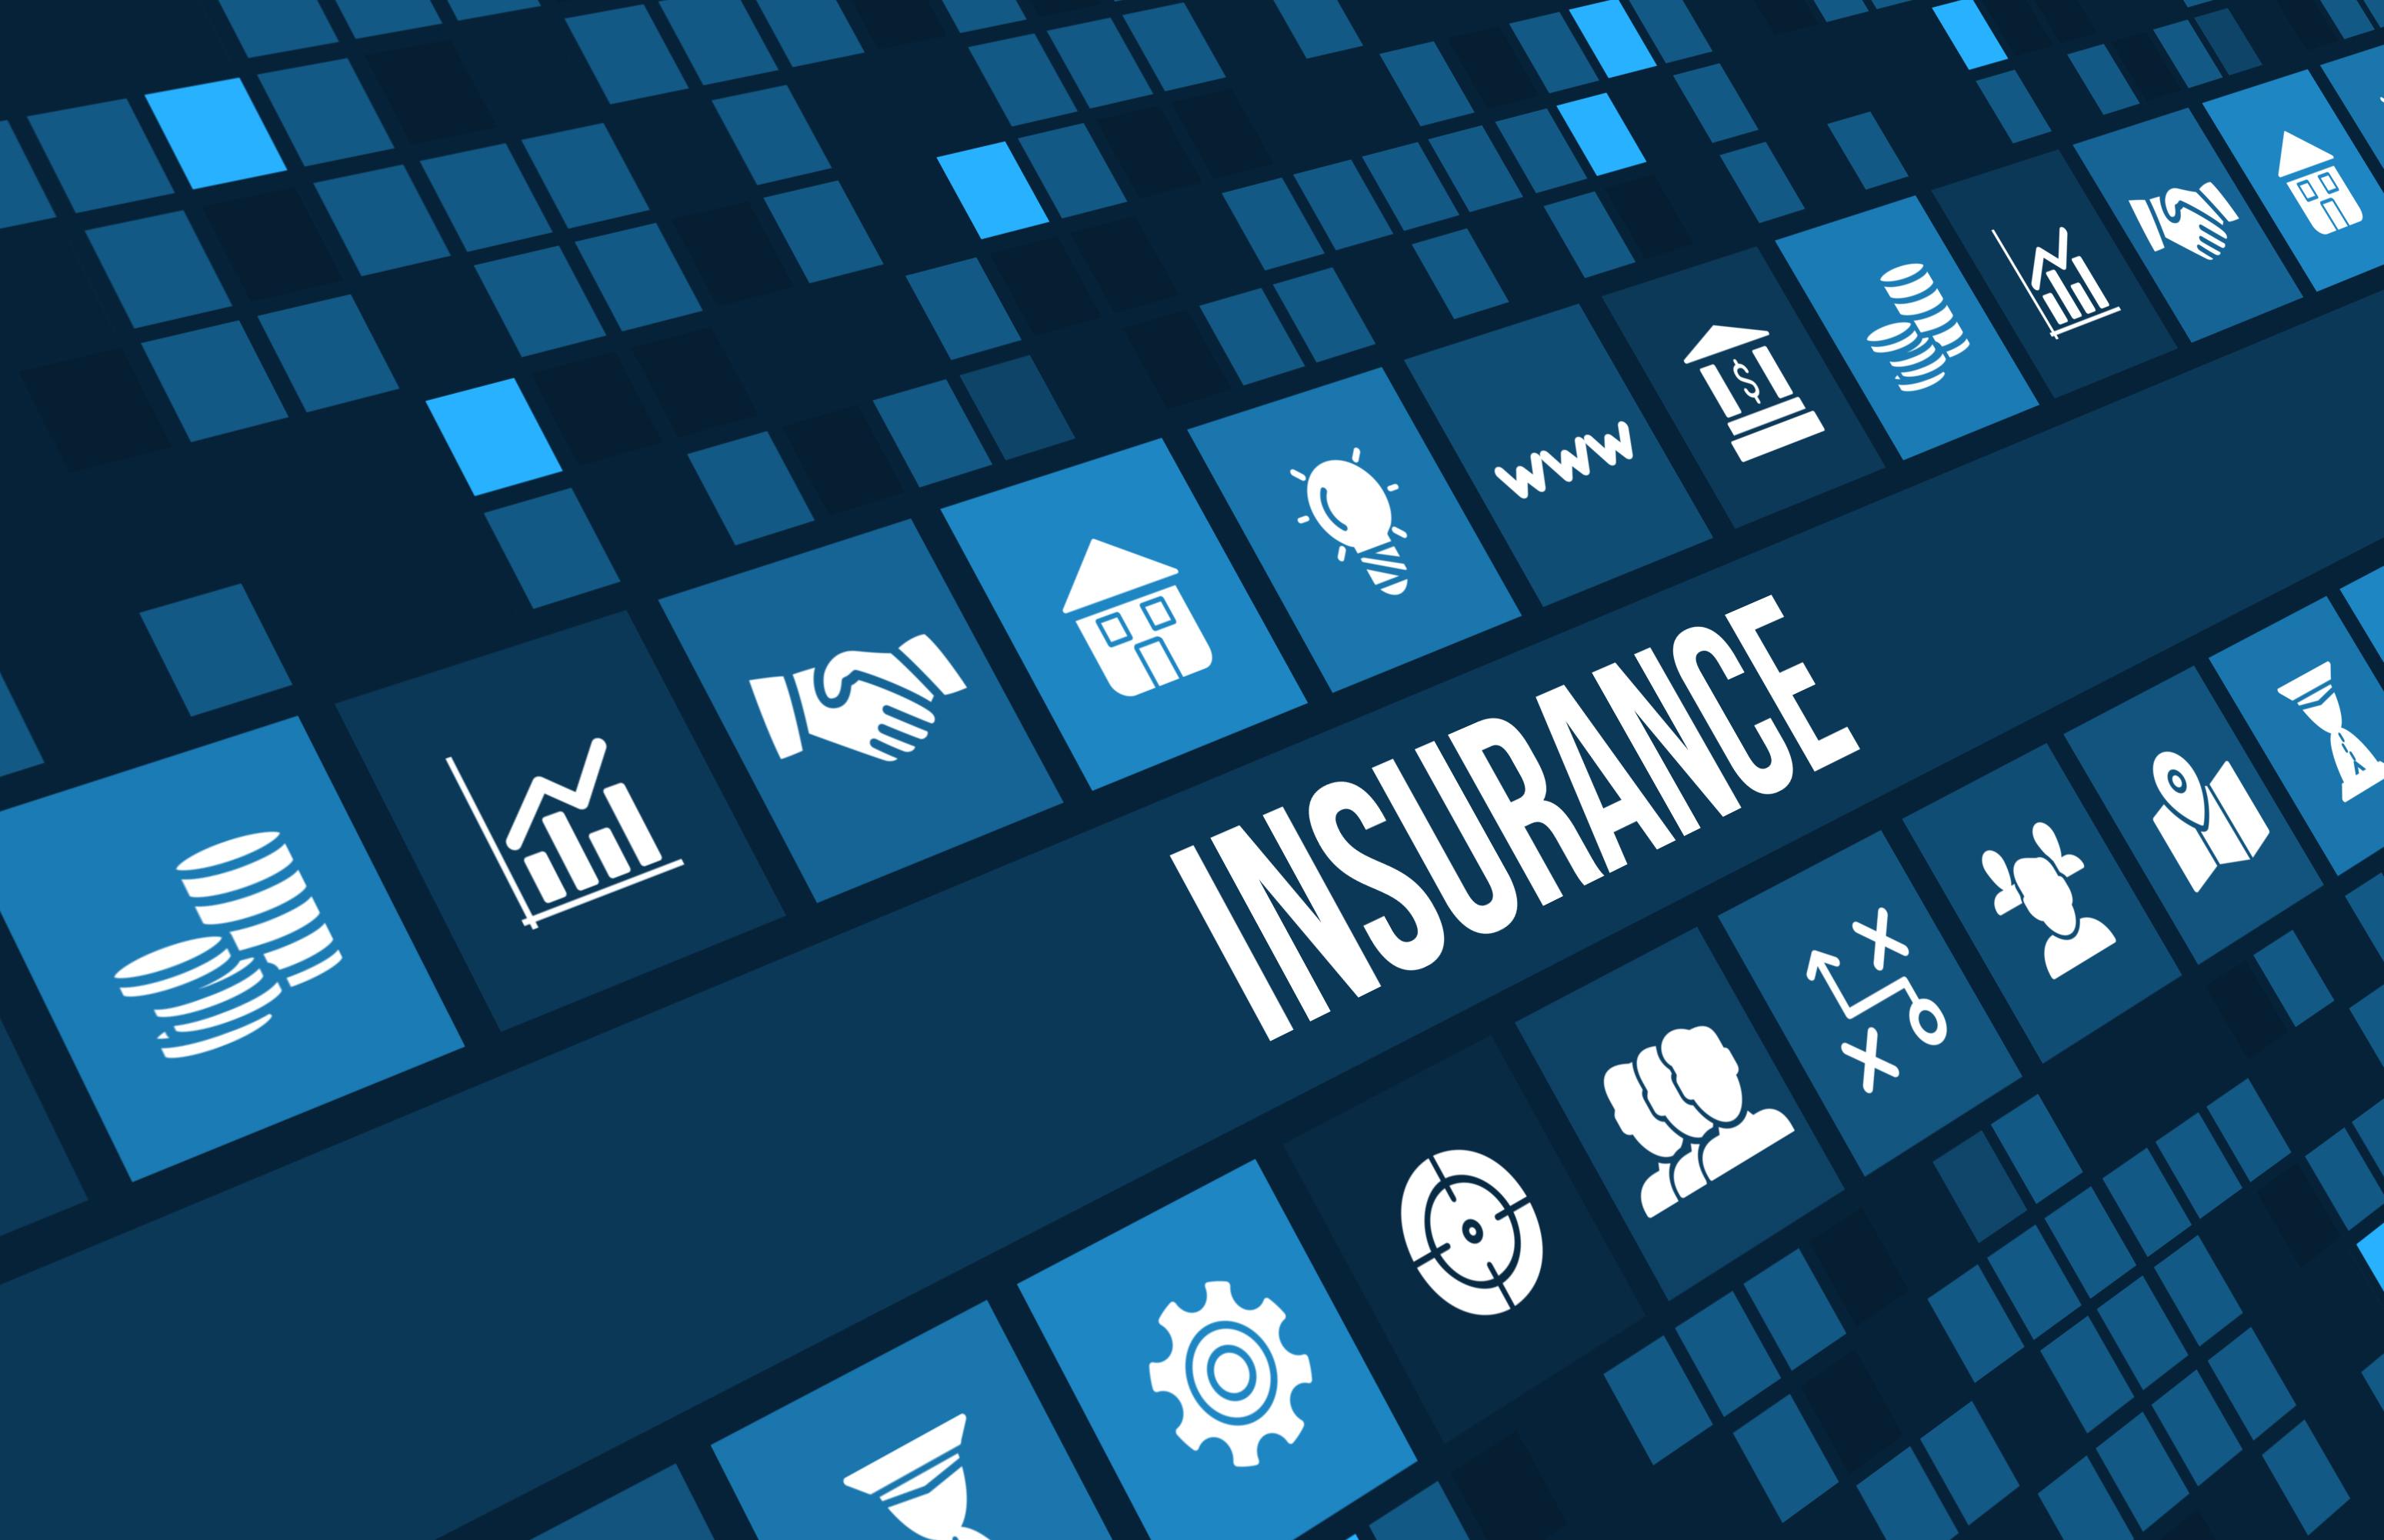 endowment insurance in nigeria